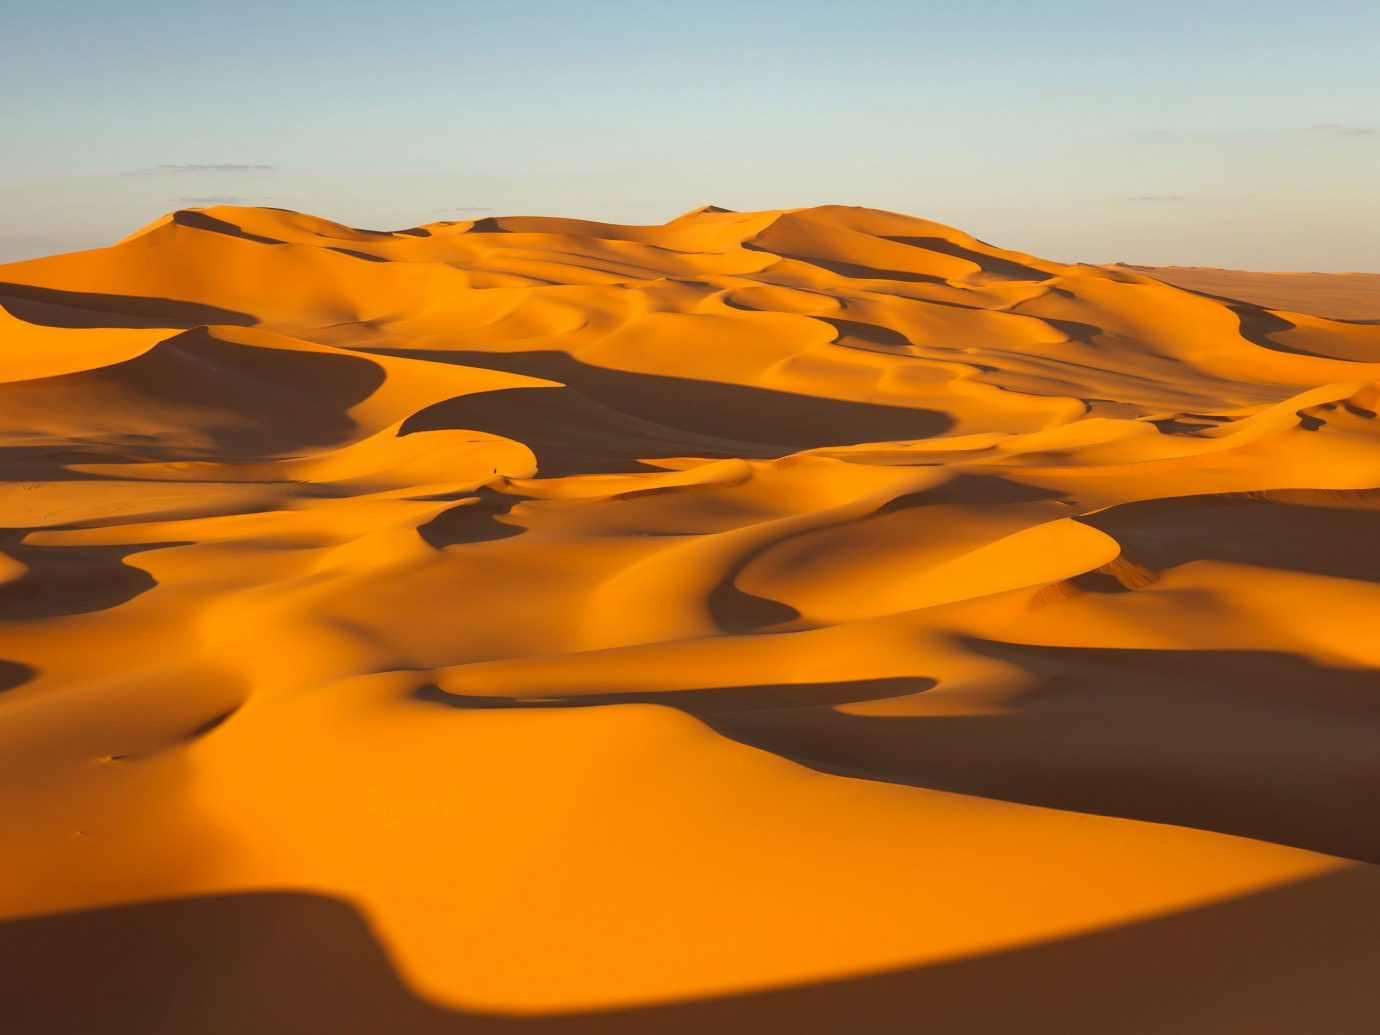 Trip Ideas erg habitat sahara geographical feature Desert natural environment Nature landform aeolian landform dune landscape sand wadi formation Sunset